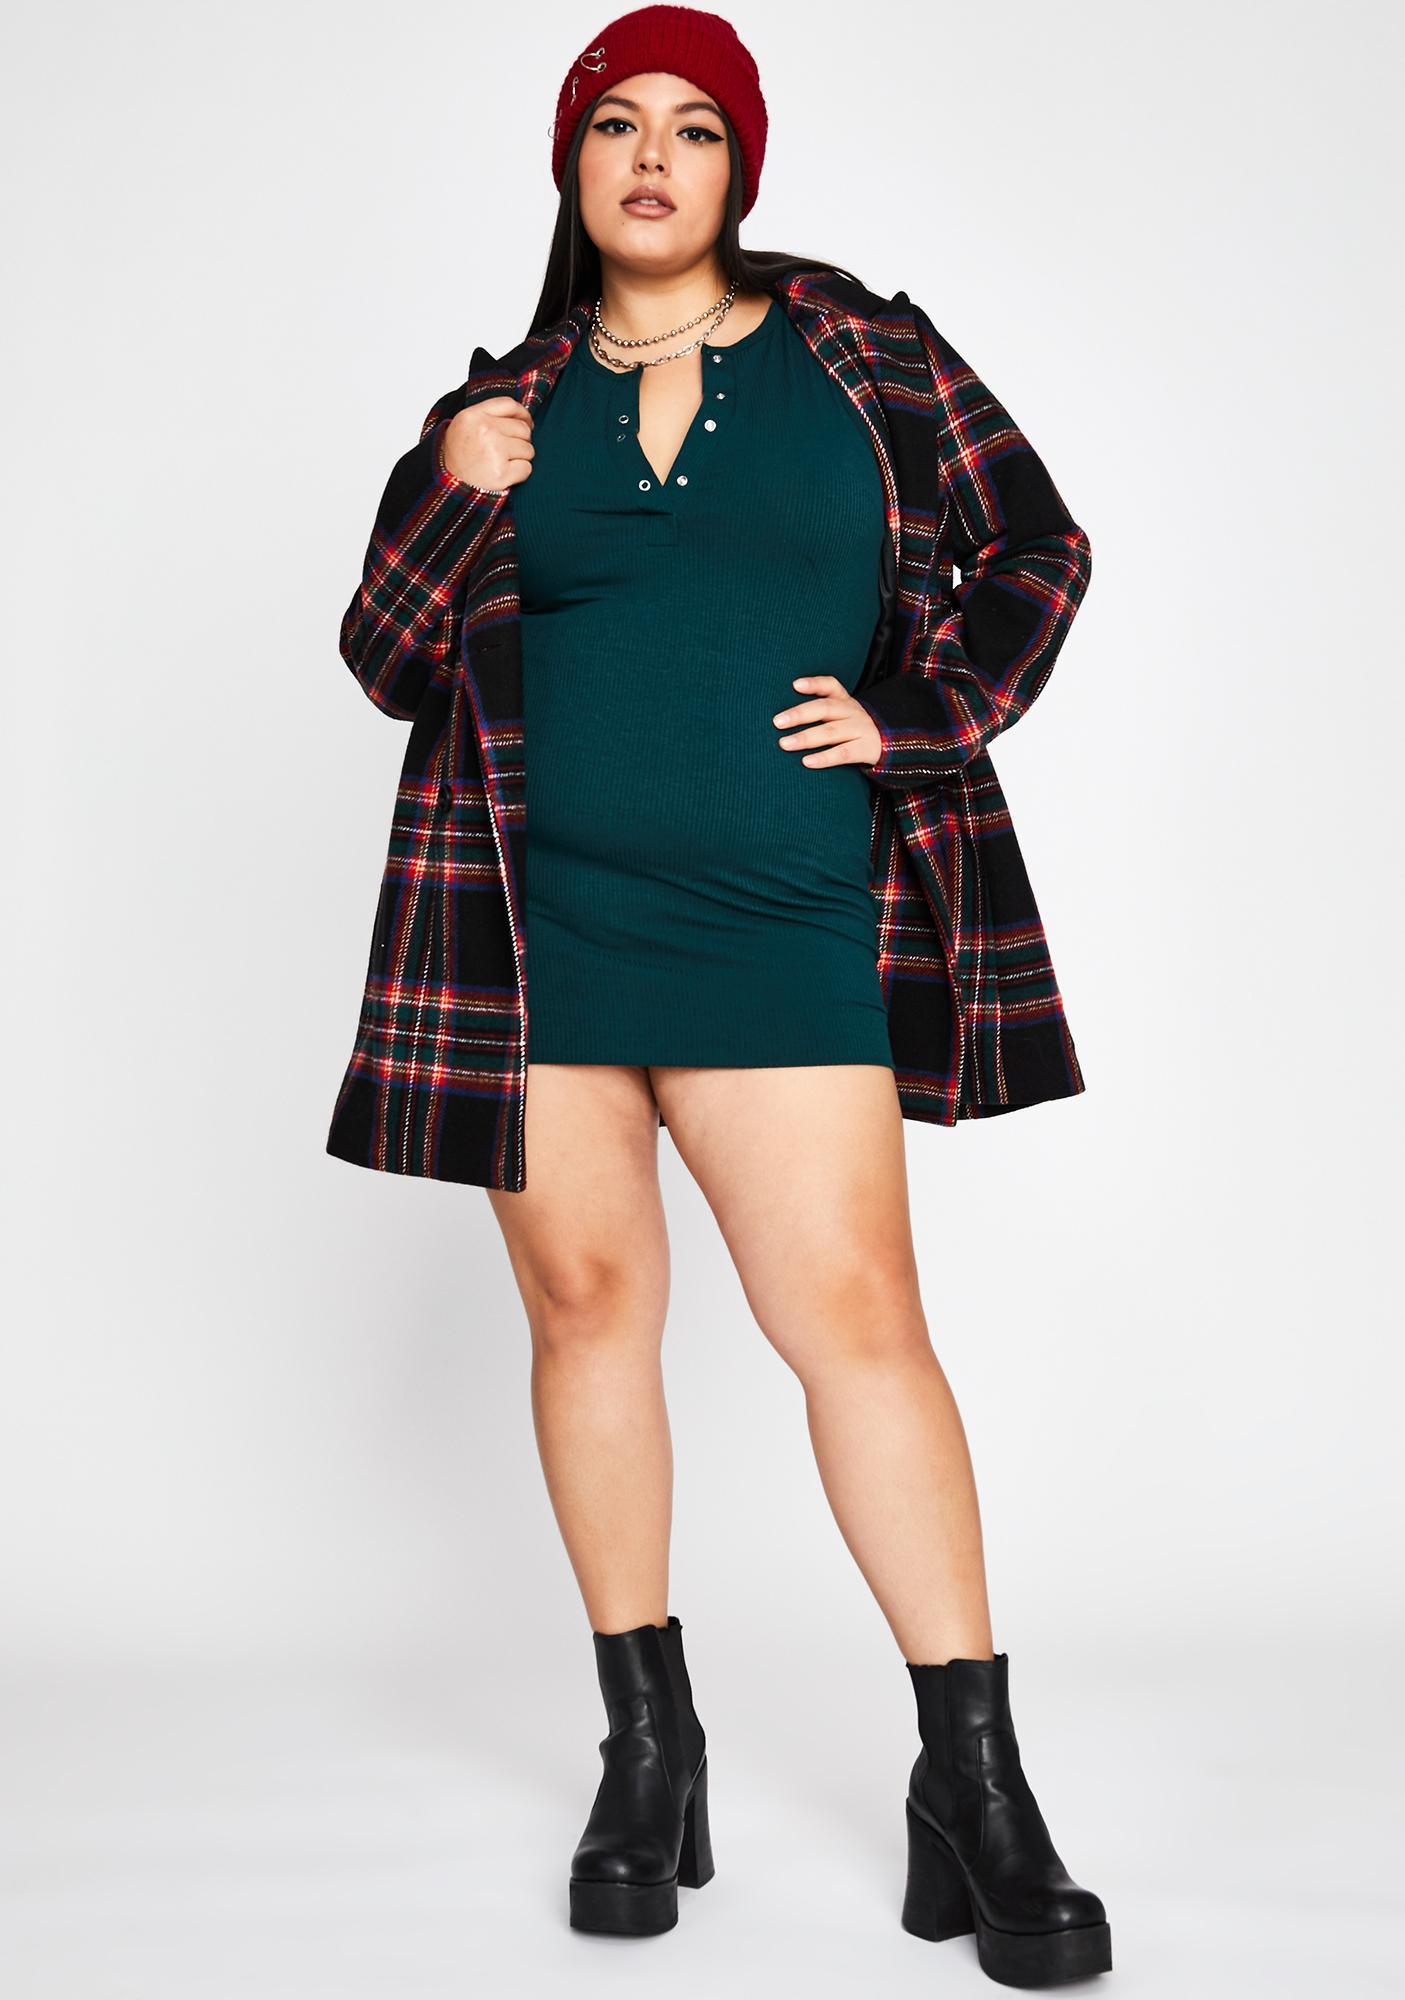 Lush Cozy Couture Sleeveless Dress